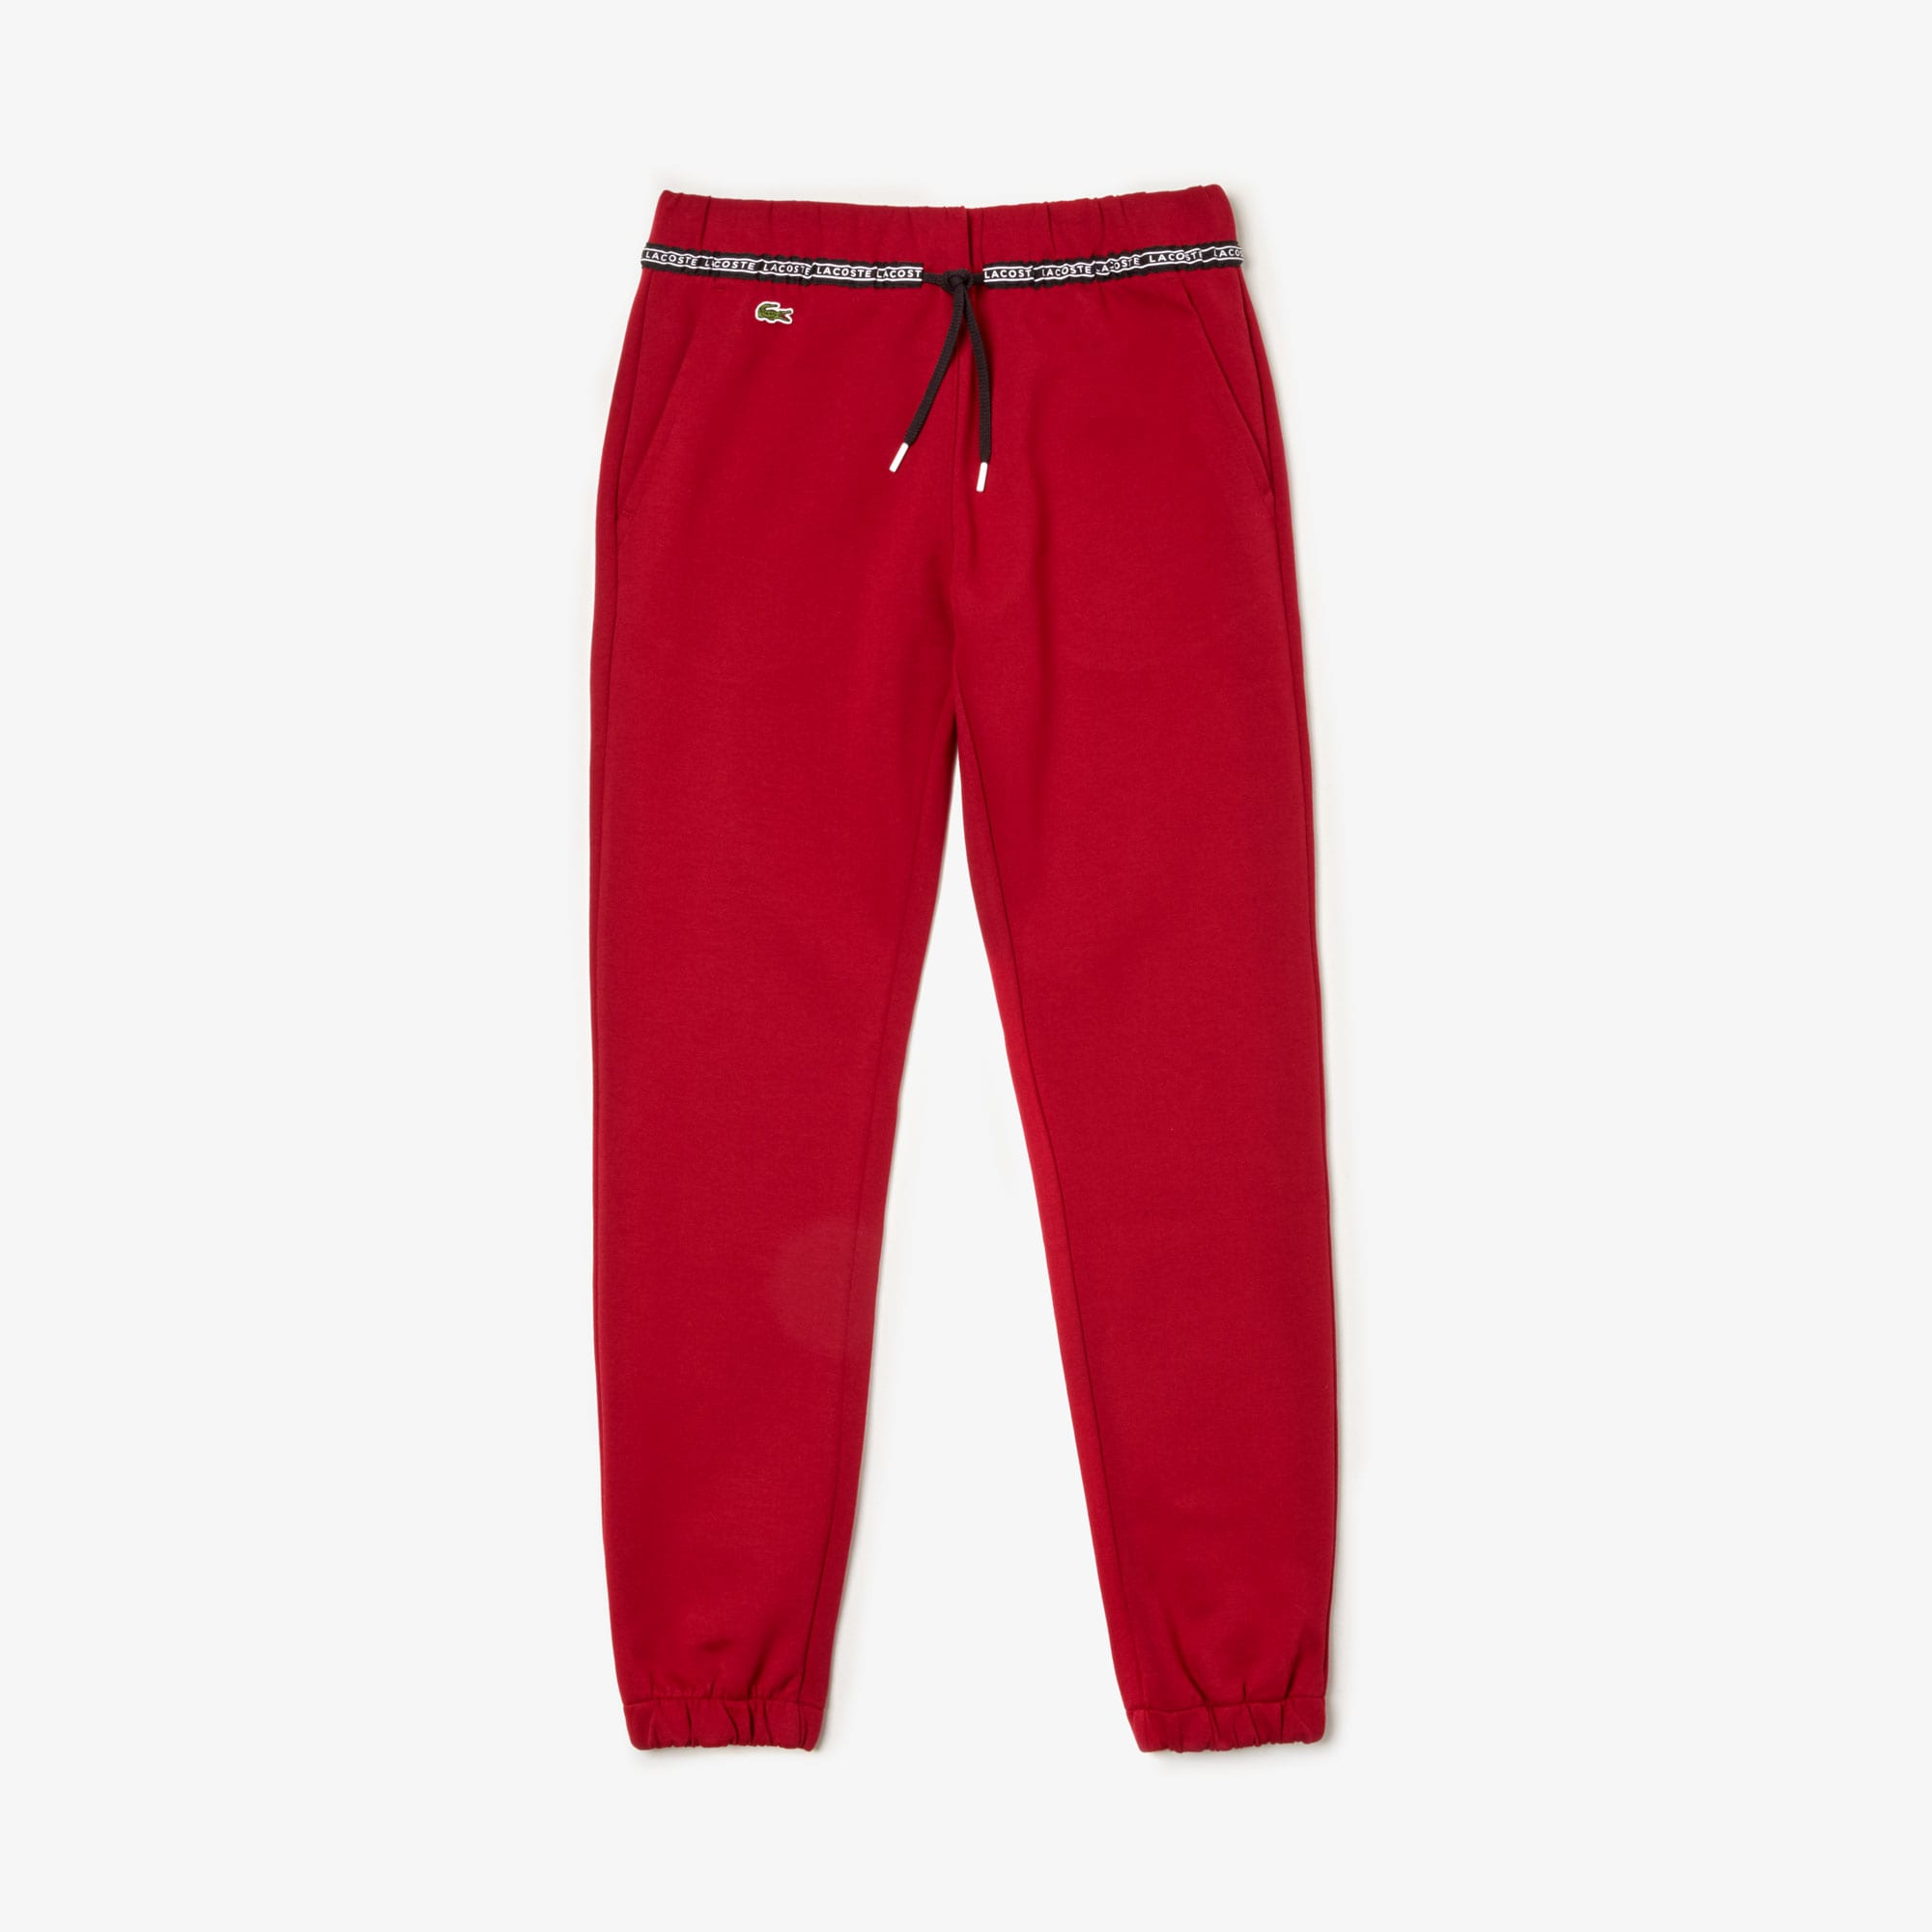 Lacoste Pants Women's SPORT Signature Waistband Fleece Sweatpants